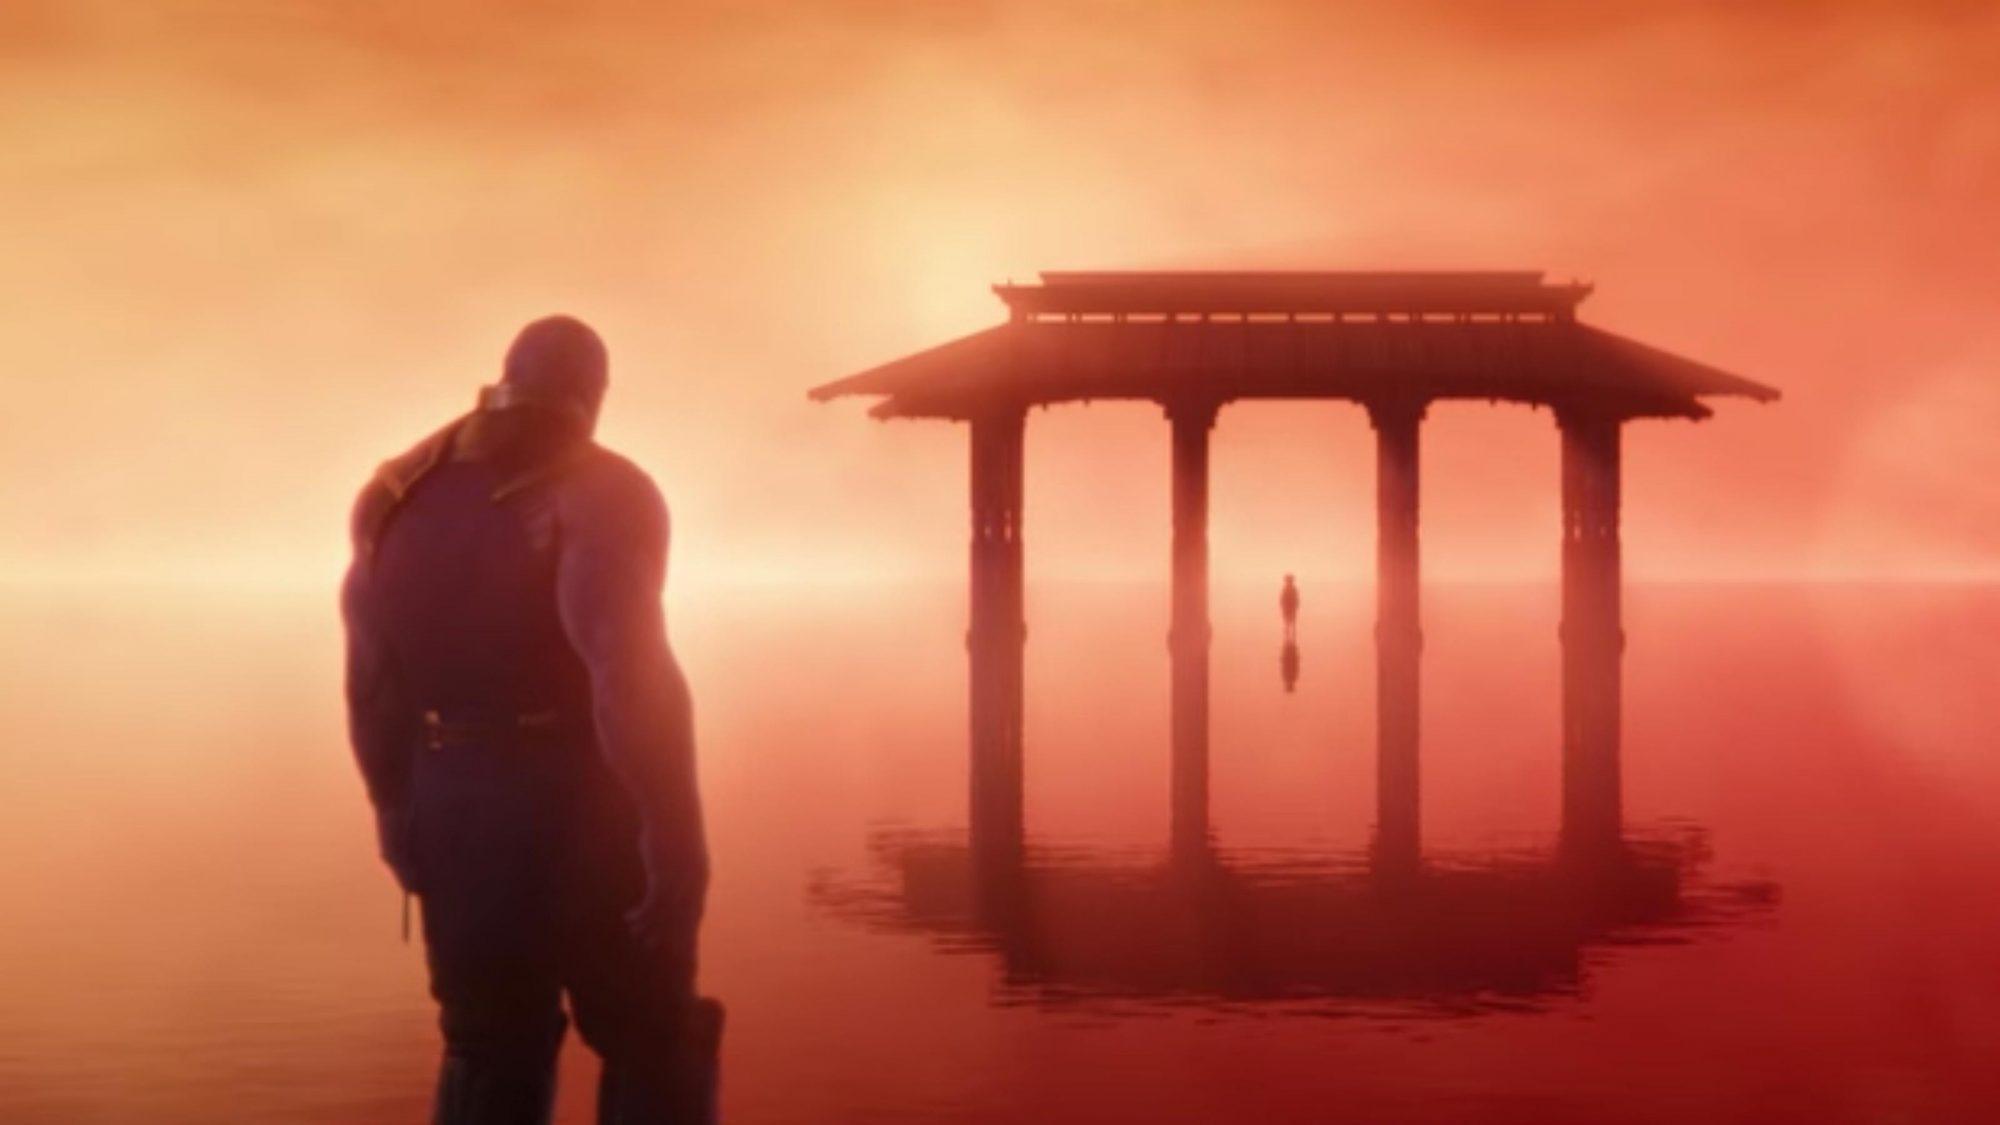 Avengers: Infinity War (screen grab) Josh Brolin as Thanos CR: Marvel Studios